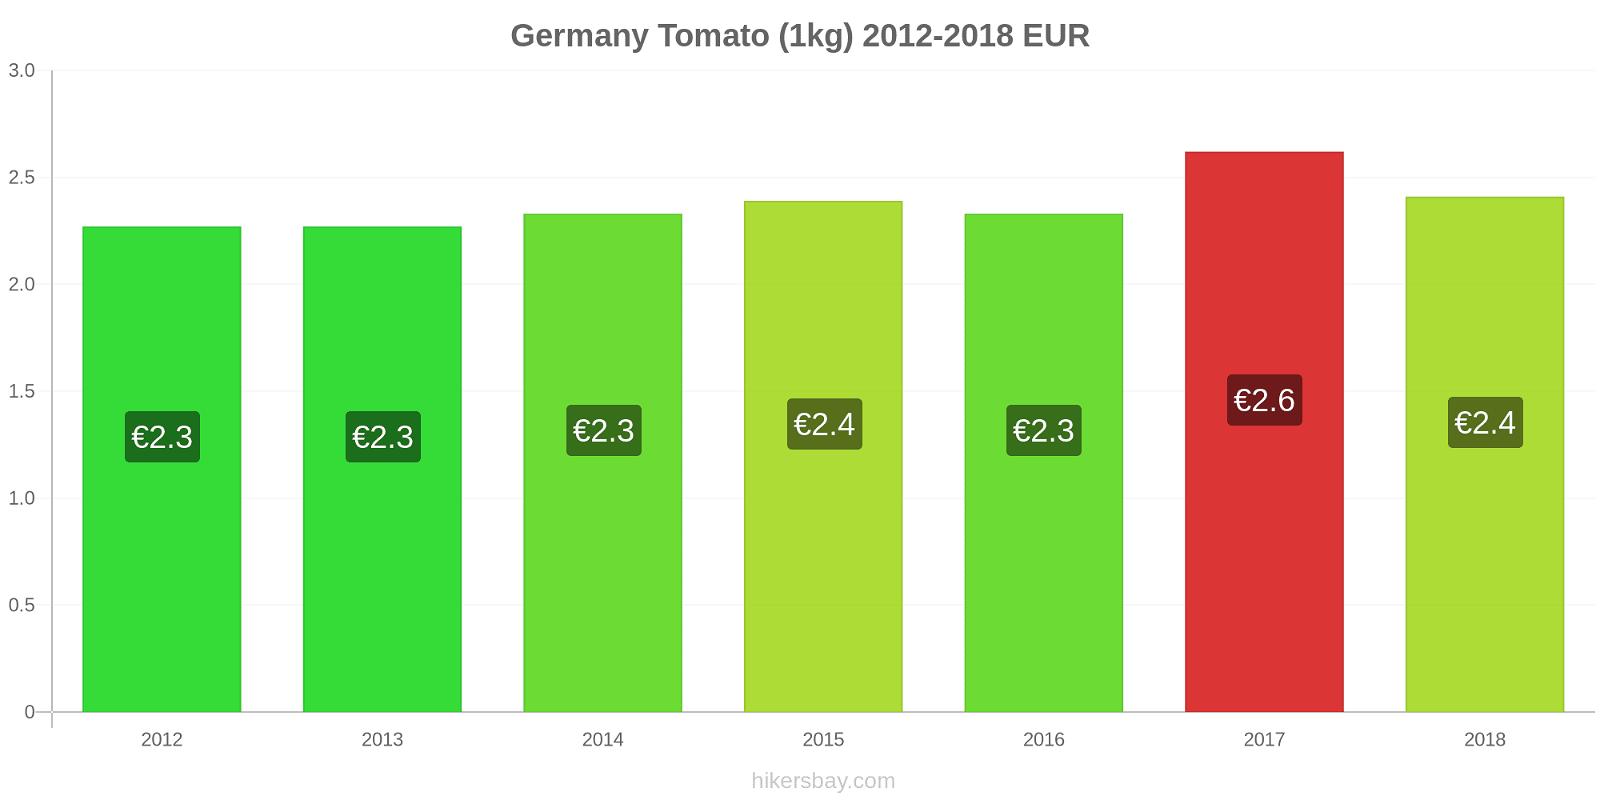 Germany price changes Tomato (1kg) hikersbay.com